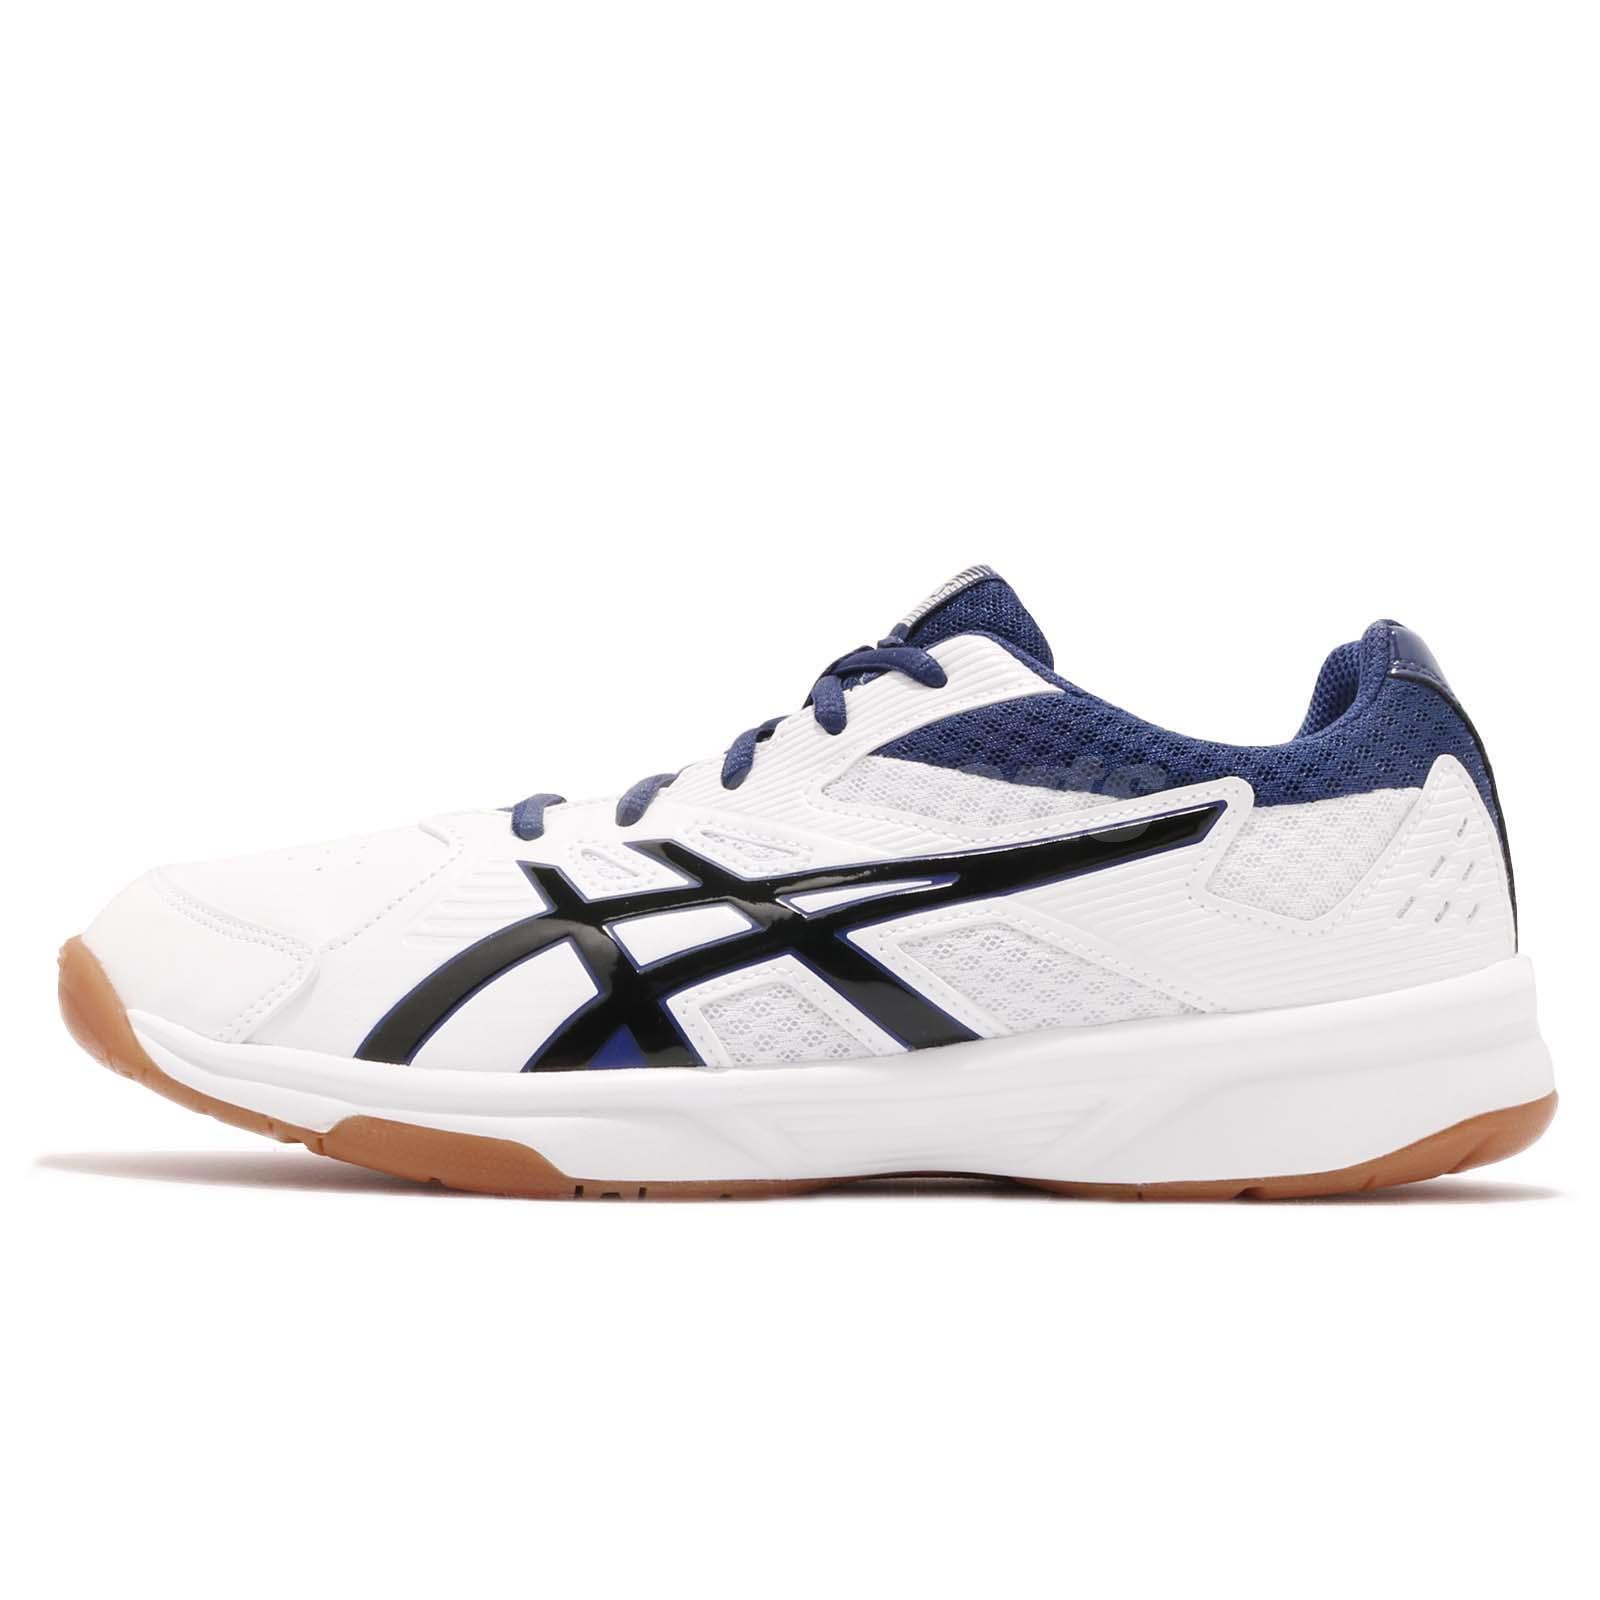 4317bdf3fde7 Asics Court Break White Black Gum Men Badminton Volleyball Shoes  1071A00-3100